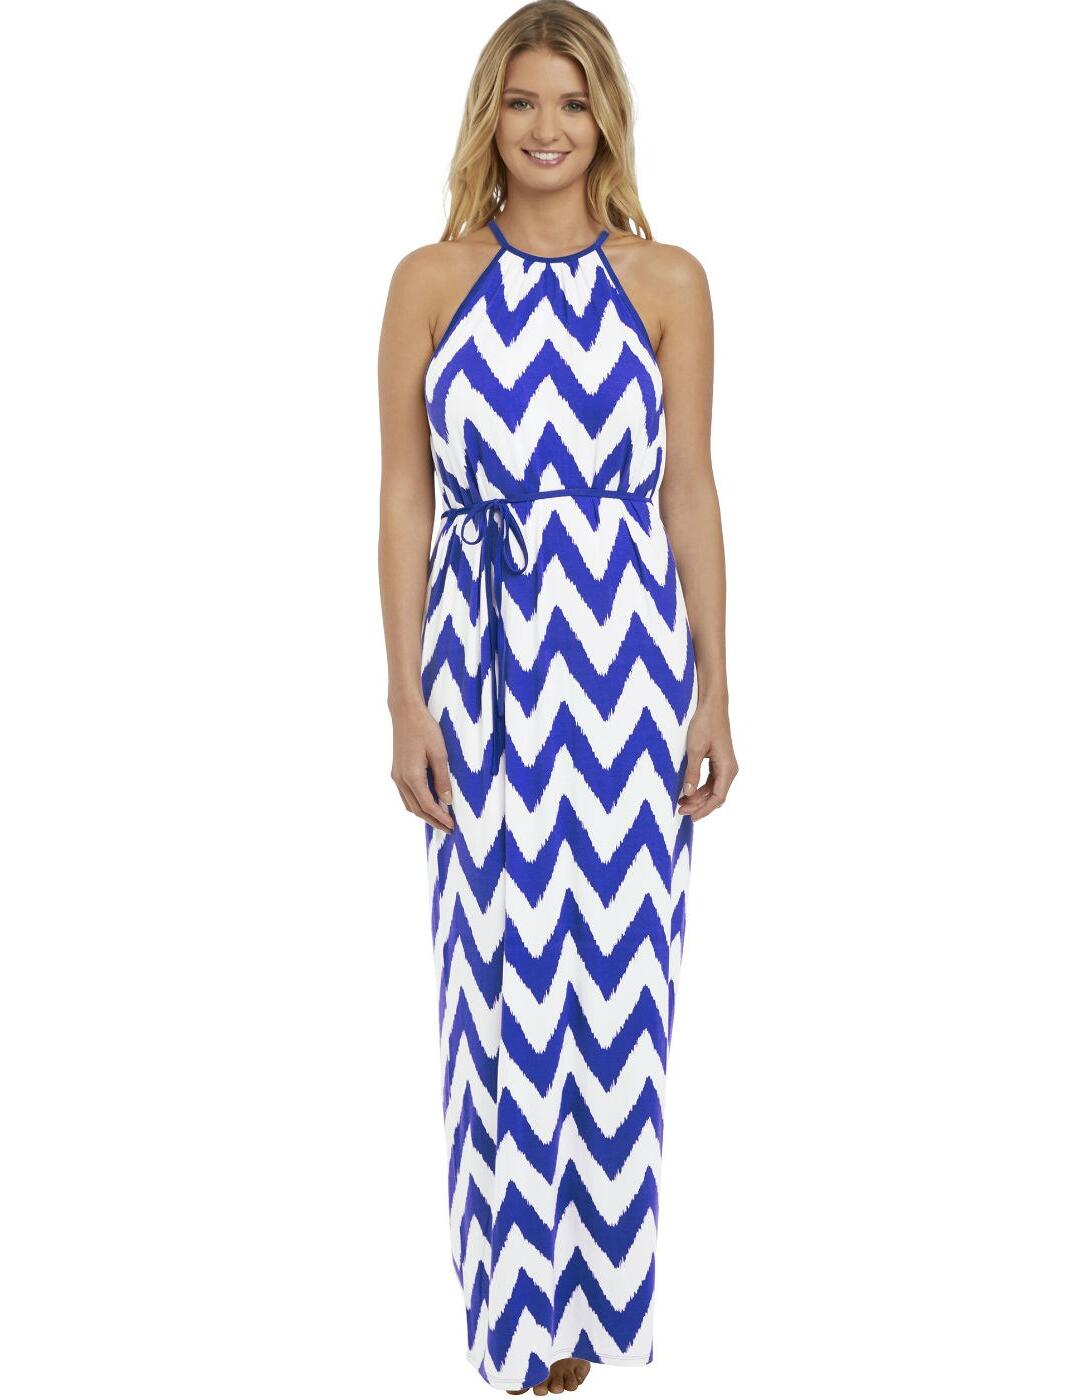 Making Waves Maxi Dress